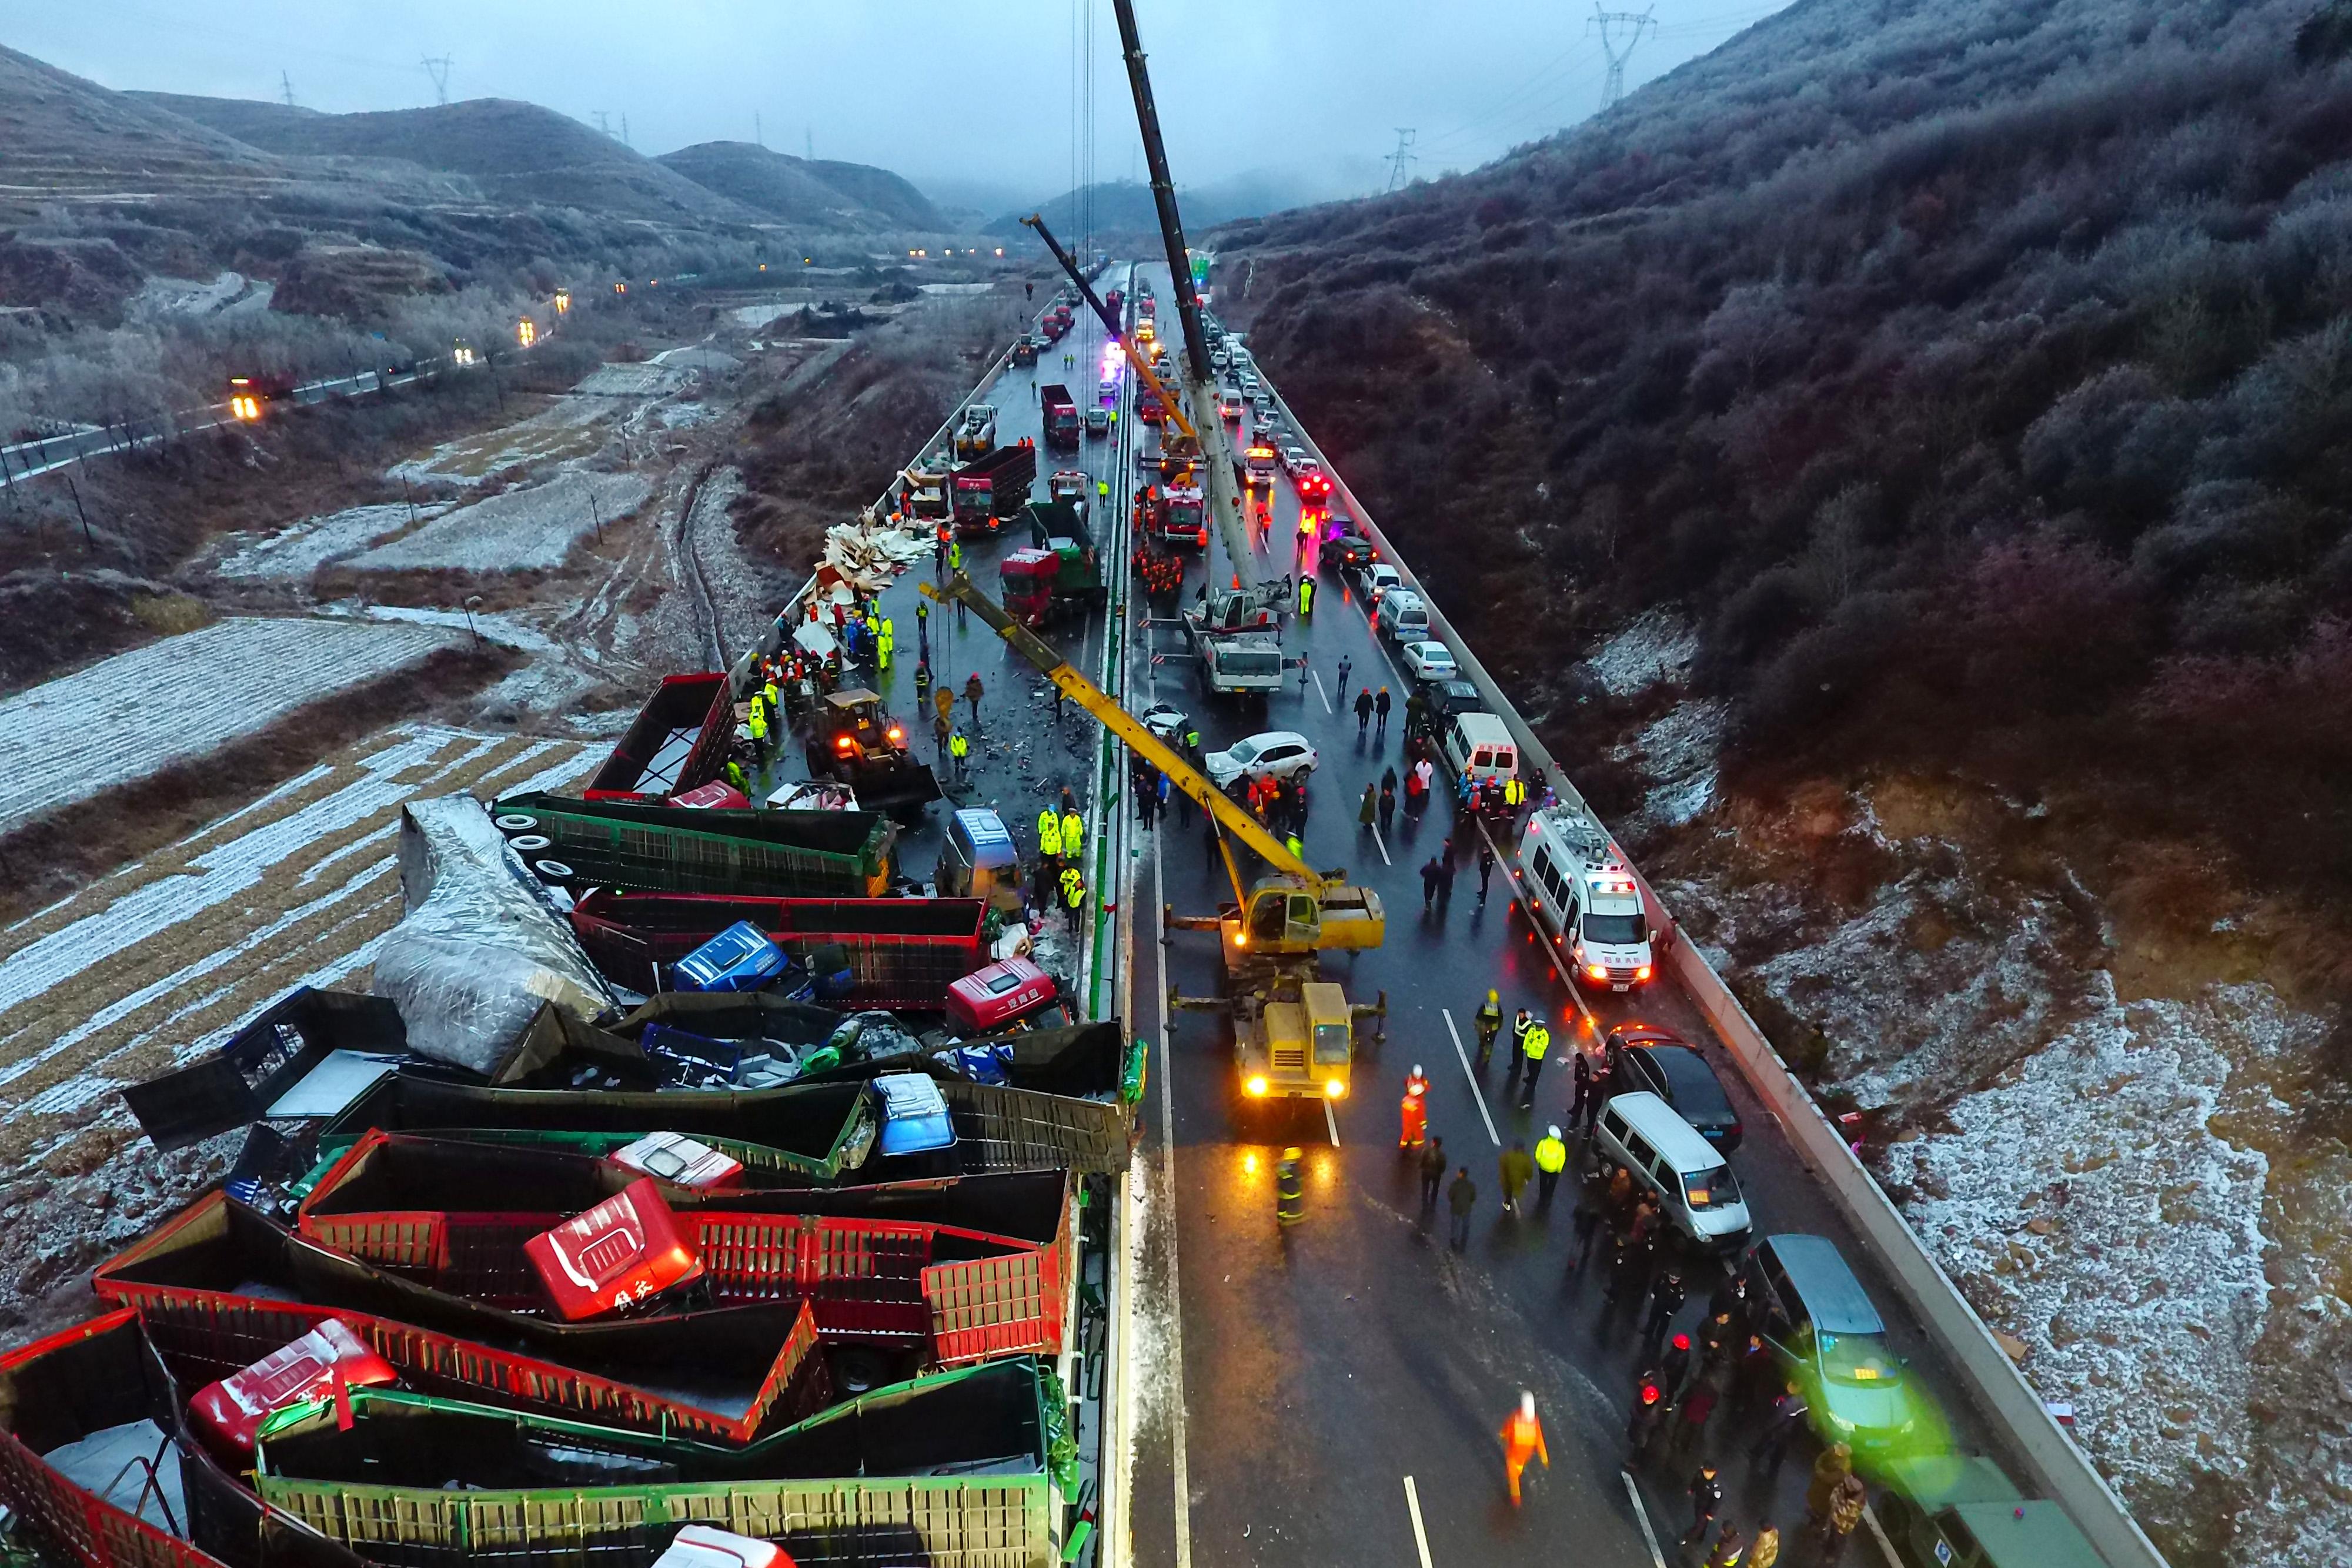 17 morti si 37 de raniti, intr-un accident in lant produs pe o autostrada. In carambol au fost implicate 56 de masini